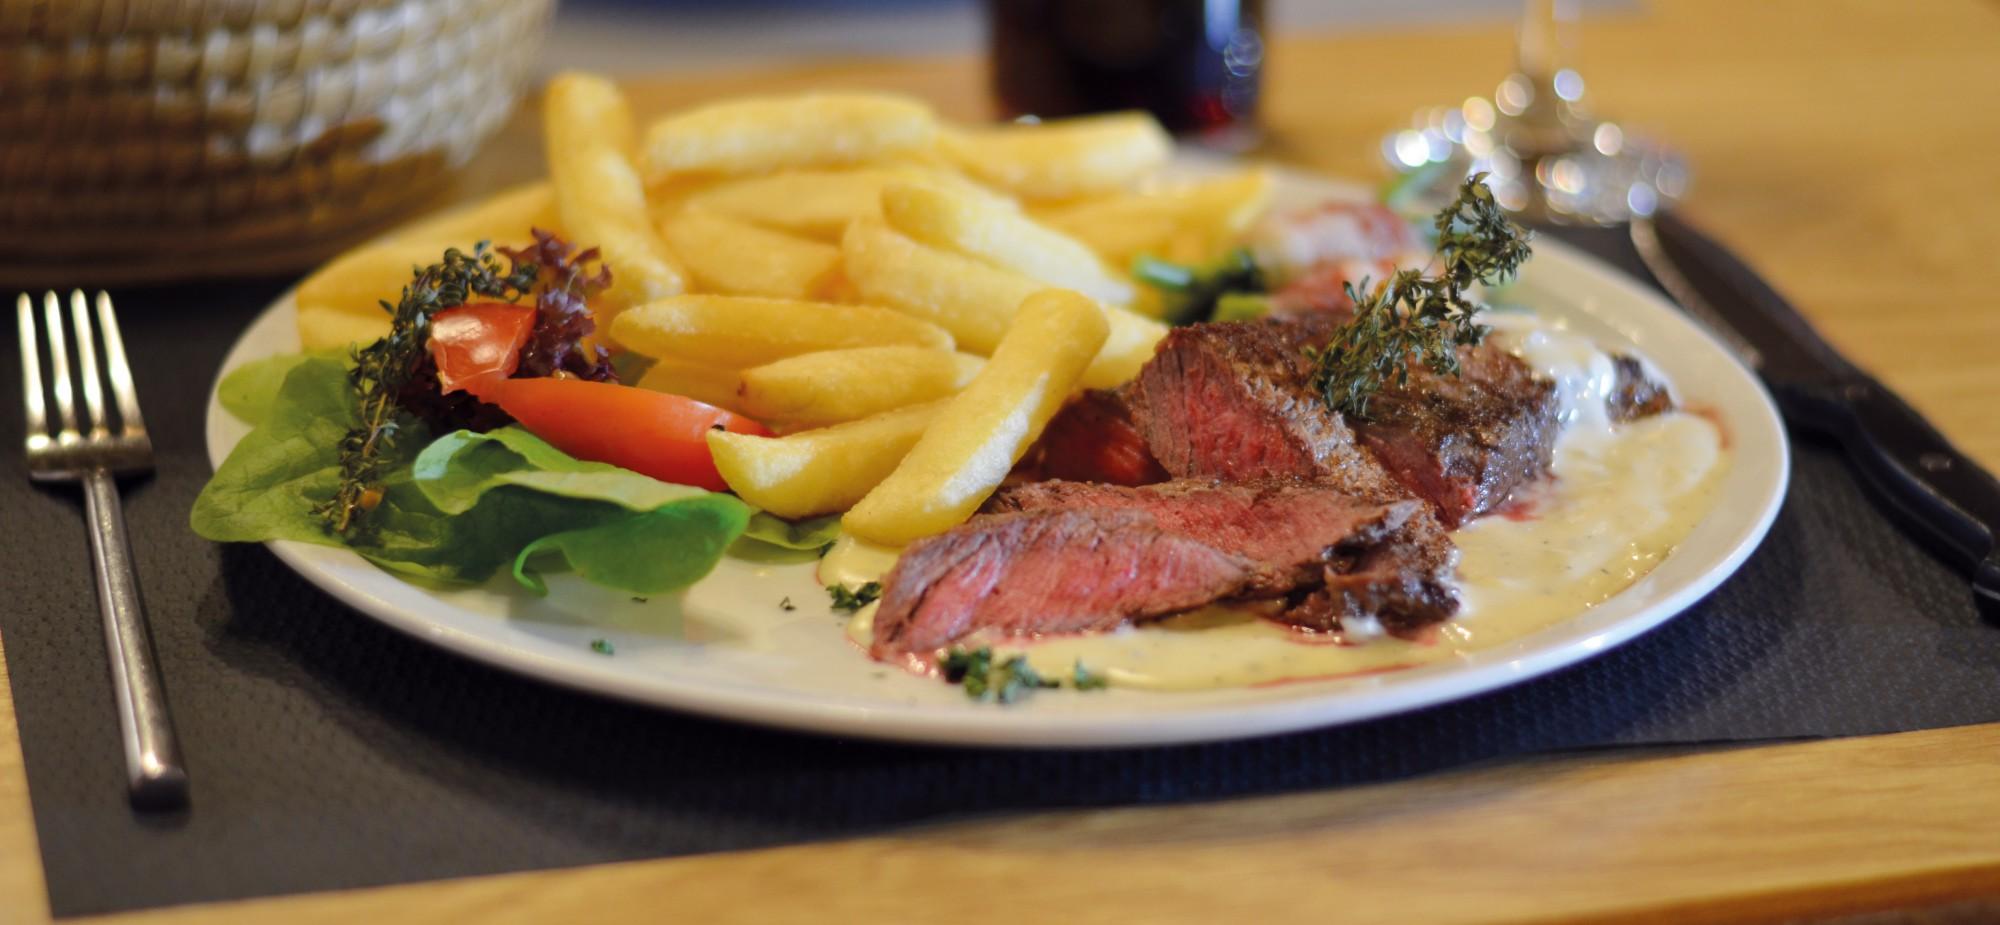 estaurant-Schmuggelbud-Überherrn-Steak-Gorgonzola